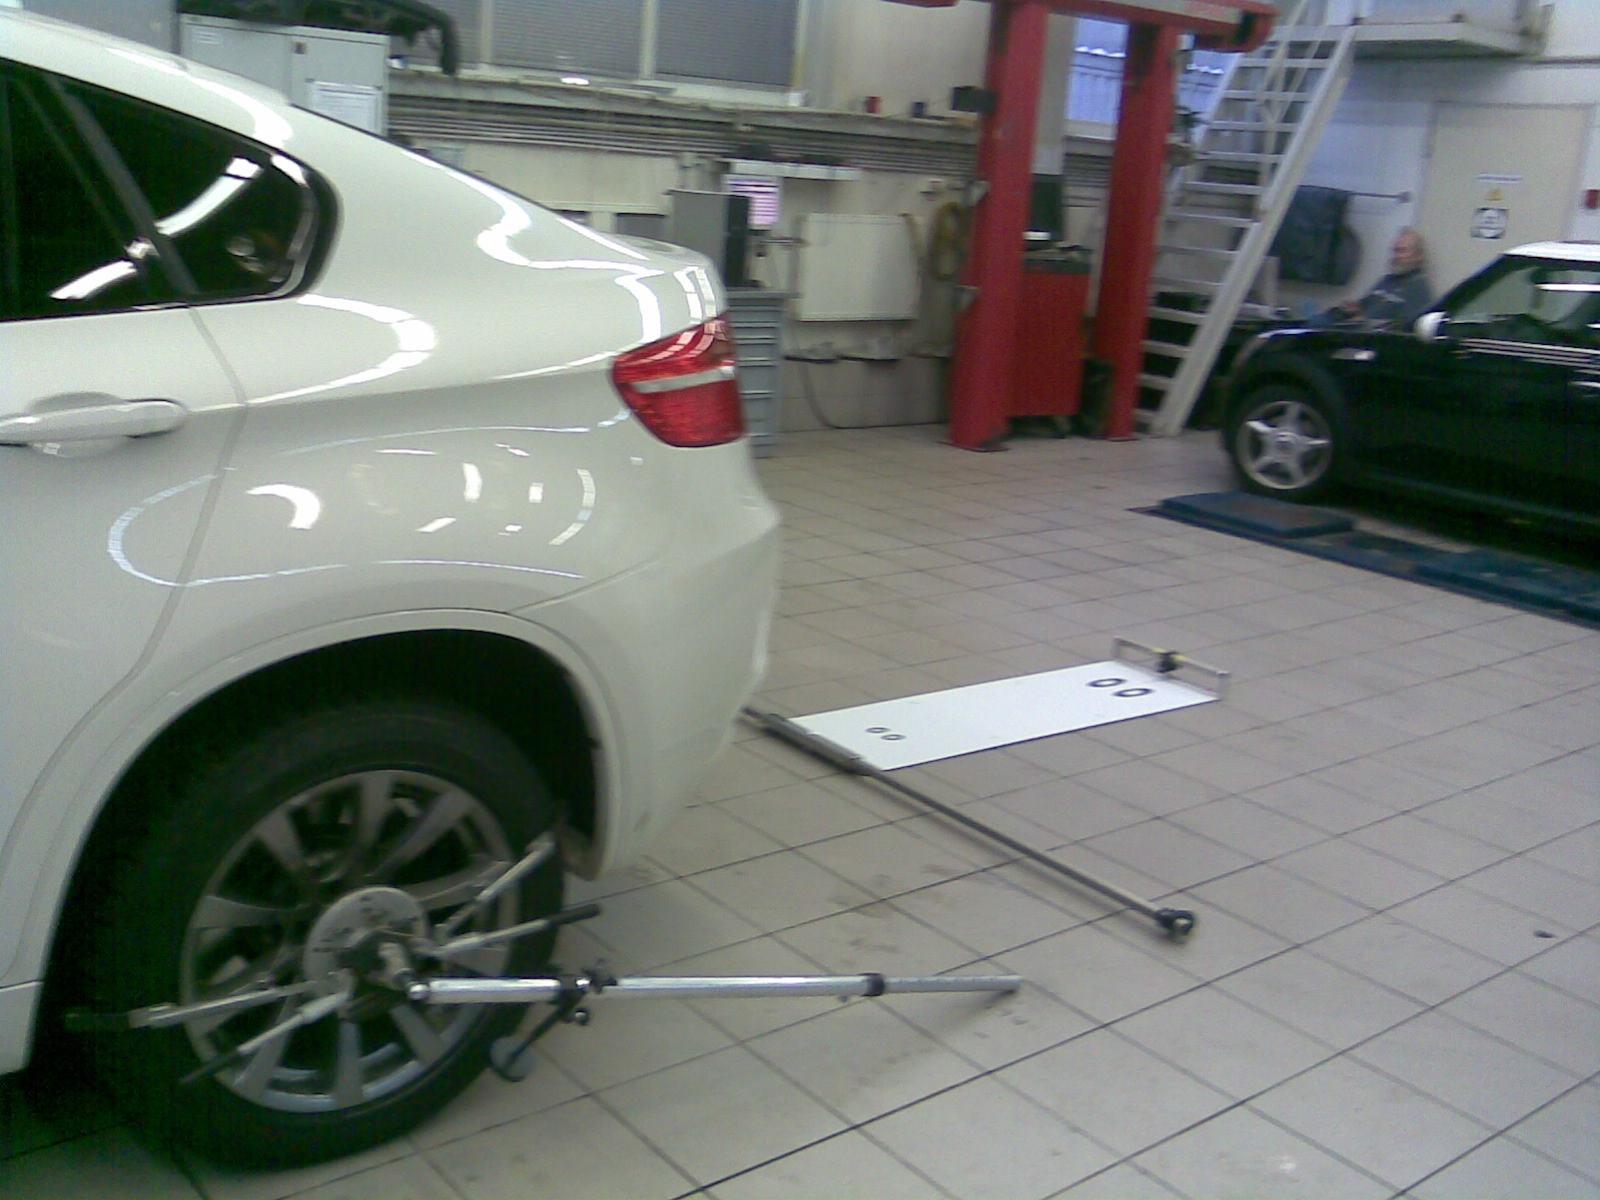 BMW X6 M › Бортжурнал › Калибровка камер ...: https://www.drive2.ru/l/288230376151984411